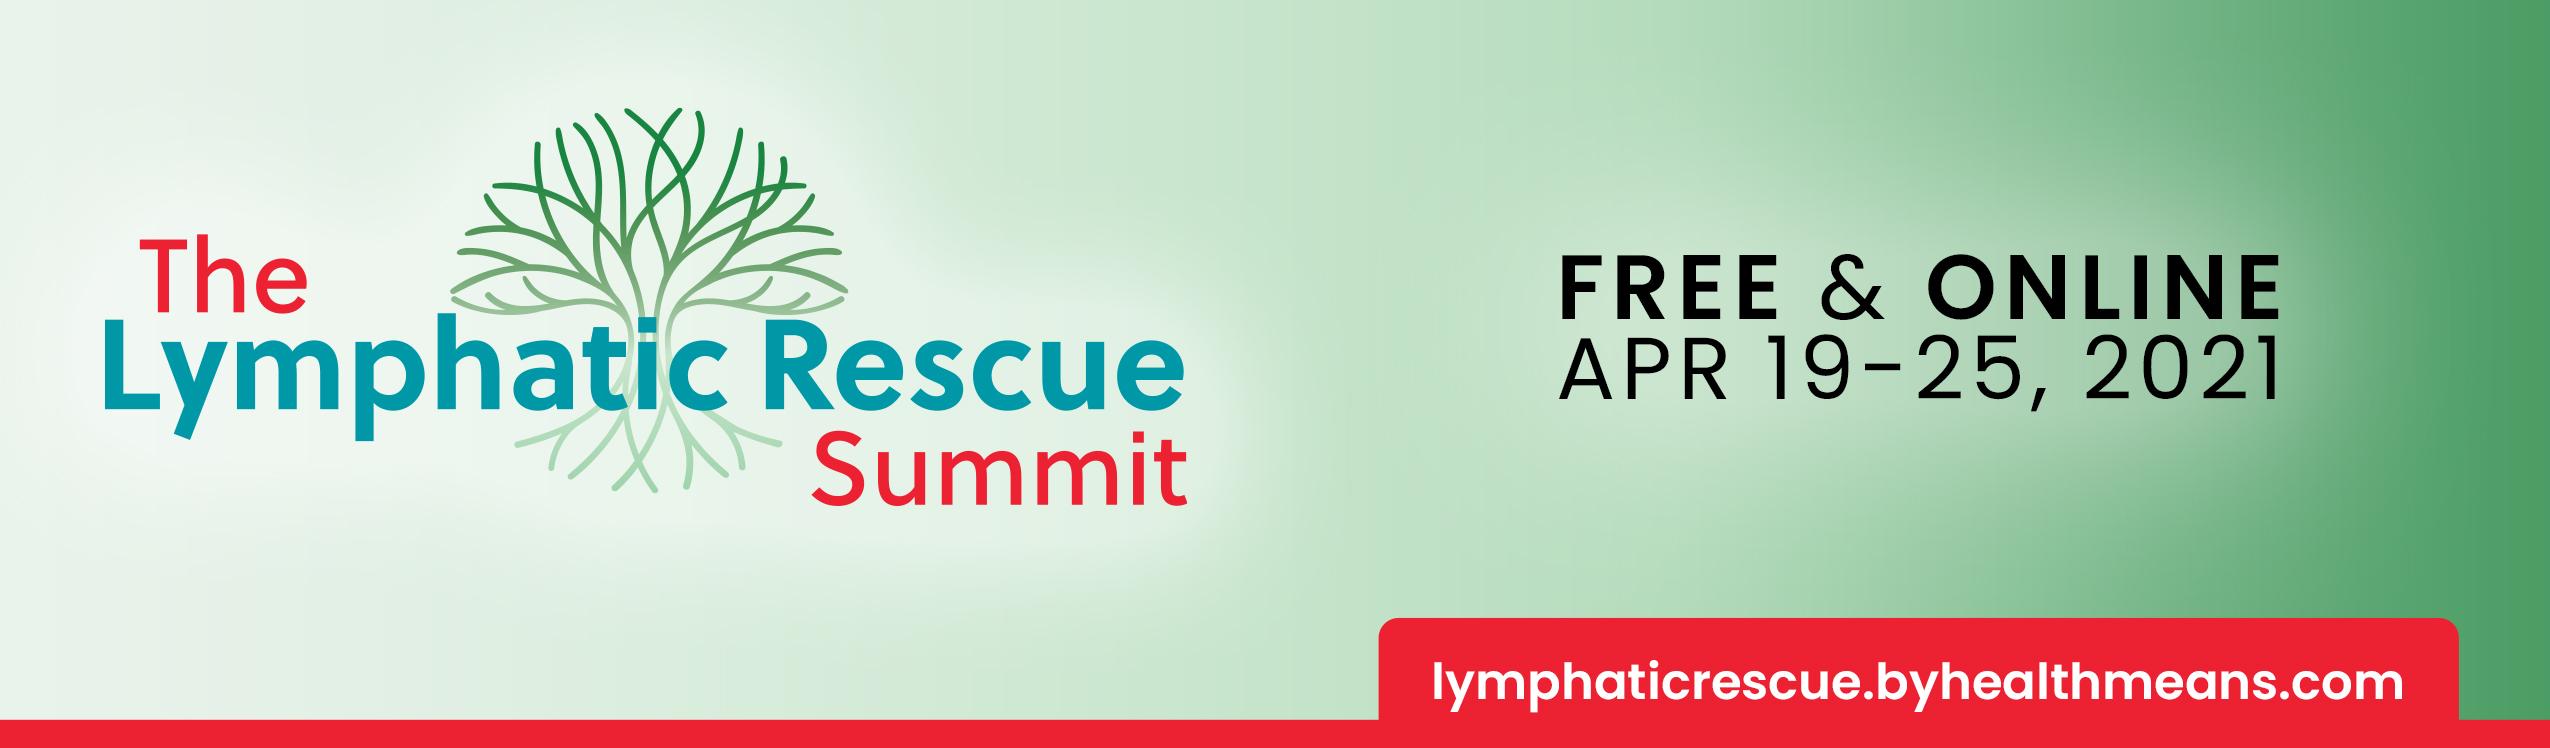 Lymphatic Rescue Summit